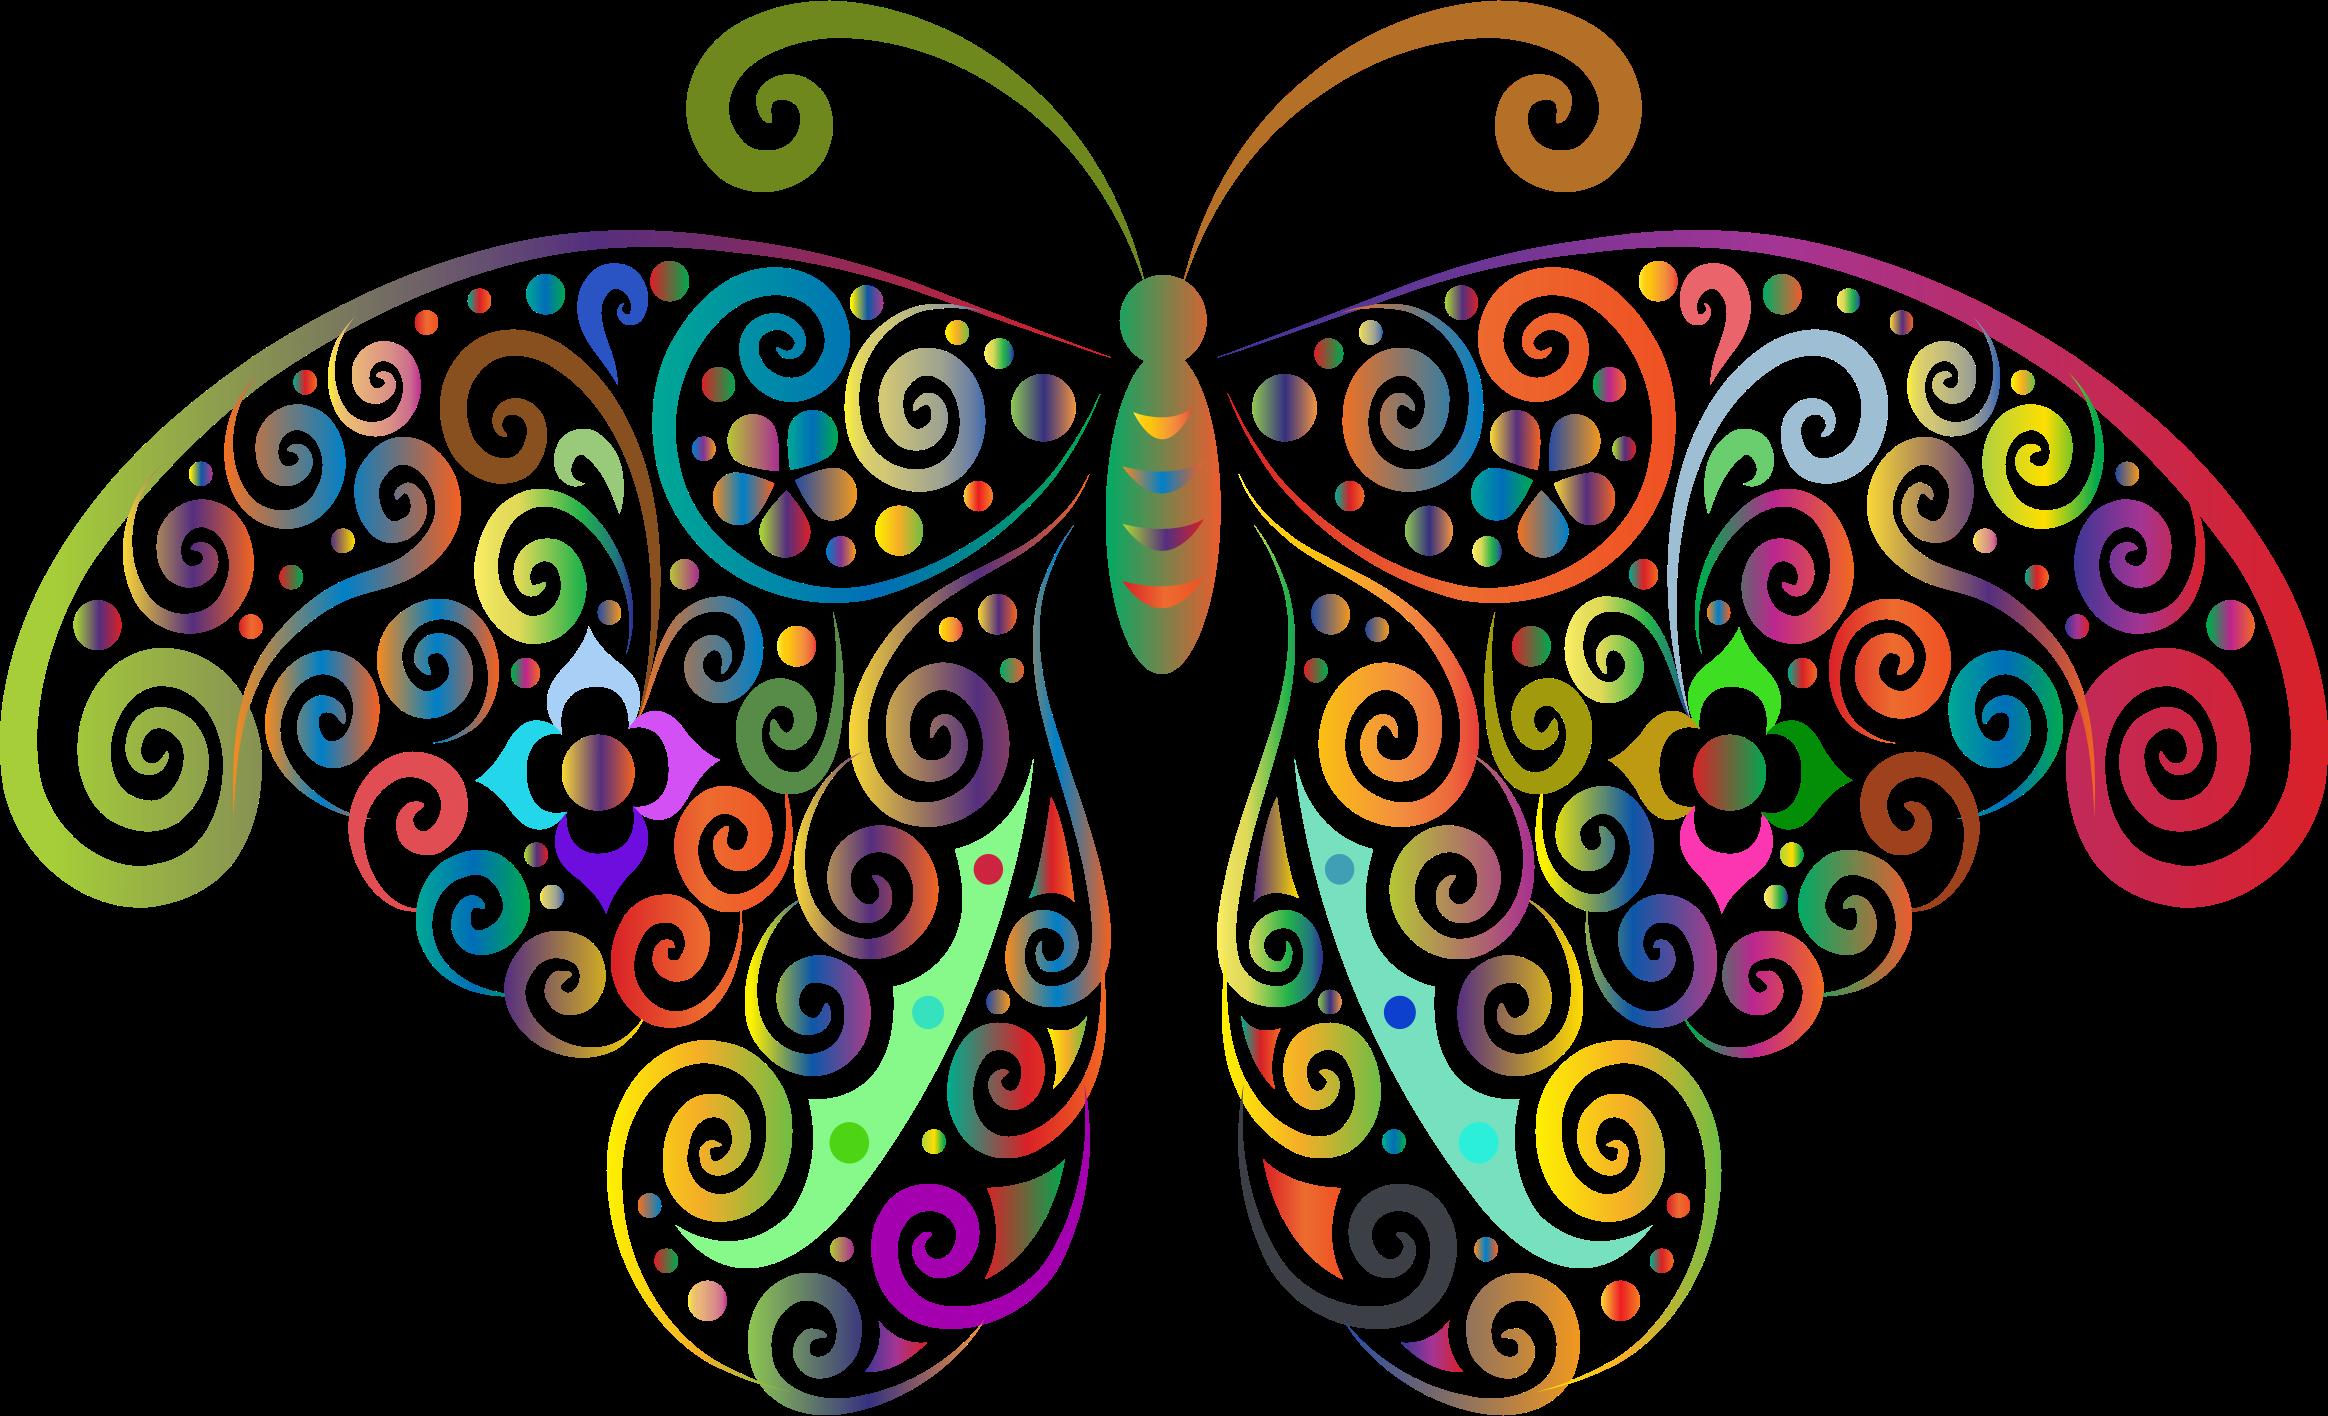 Flourish clipart butterfly. Prismatic floral silhouette no